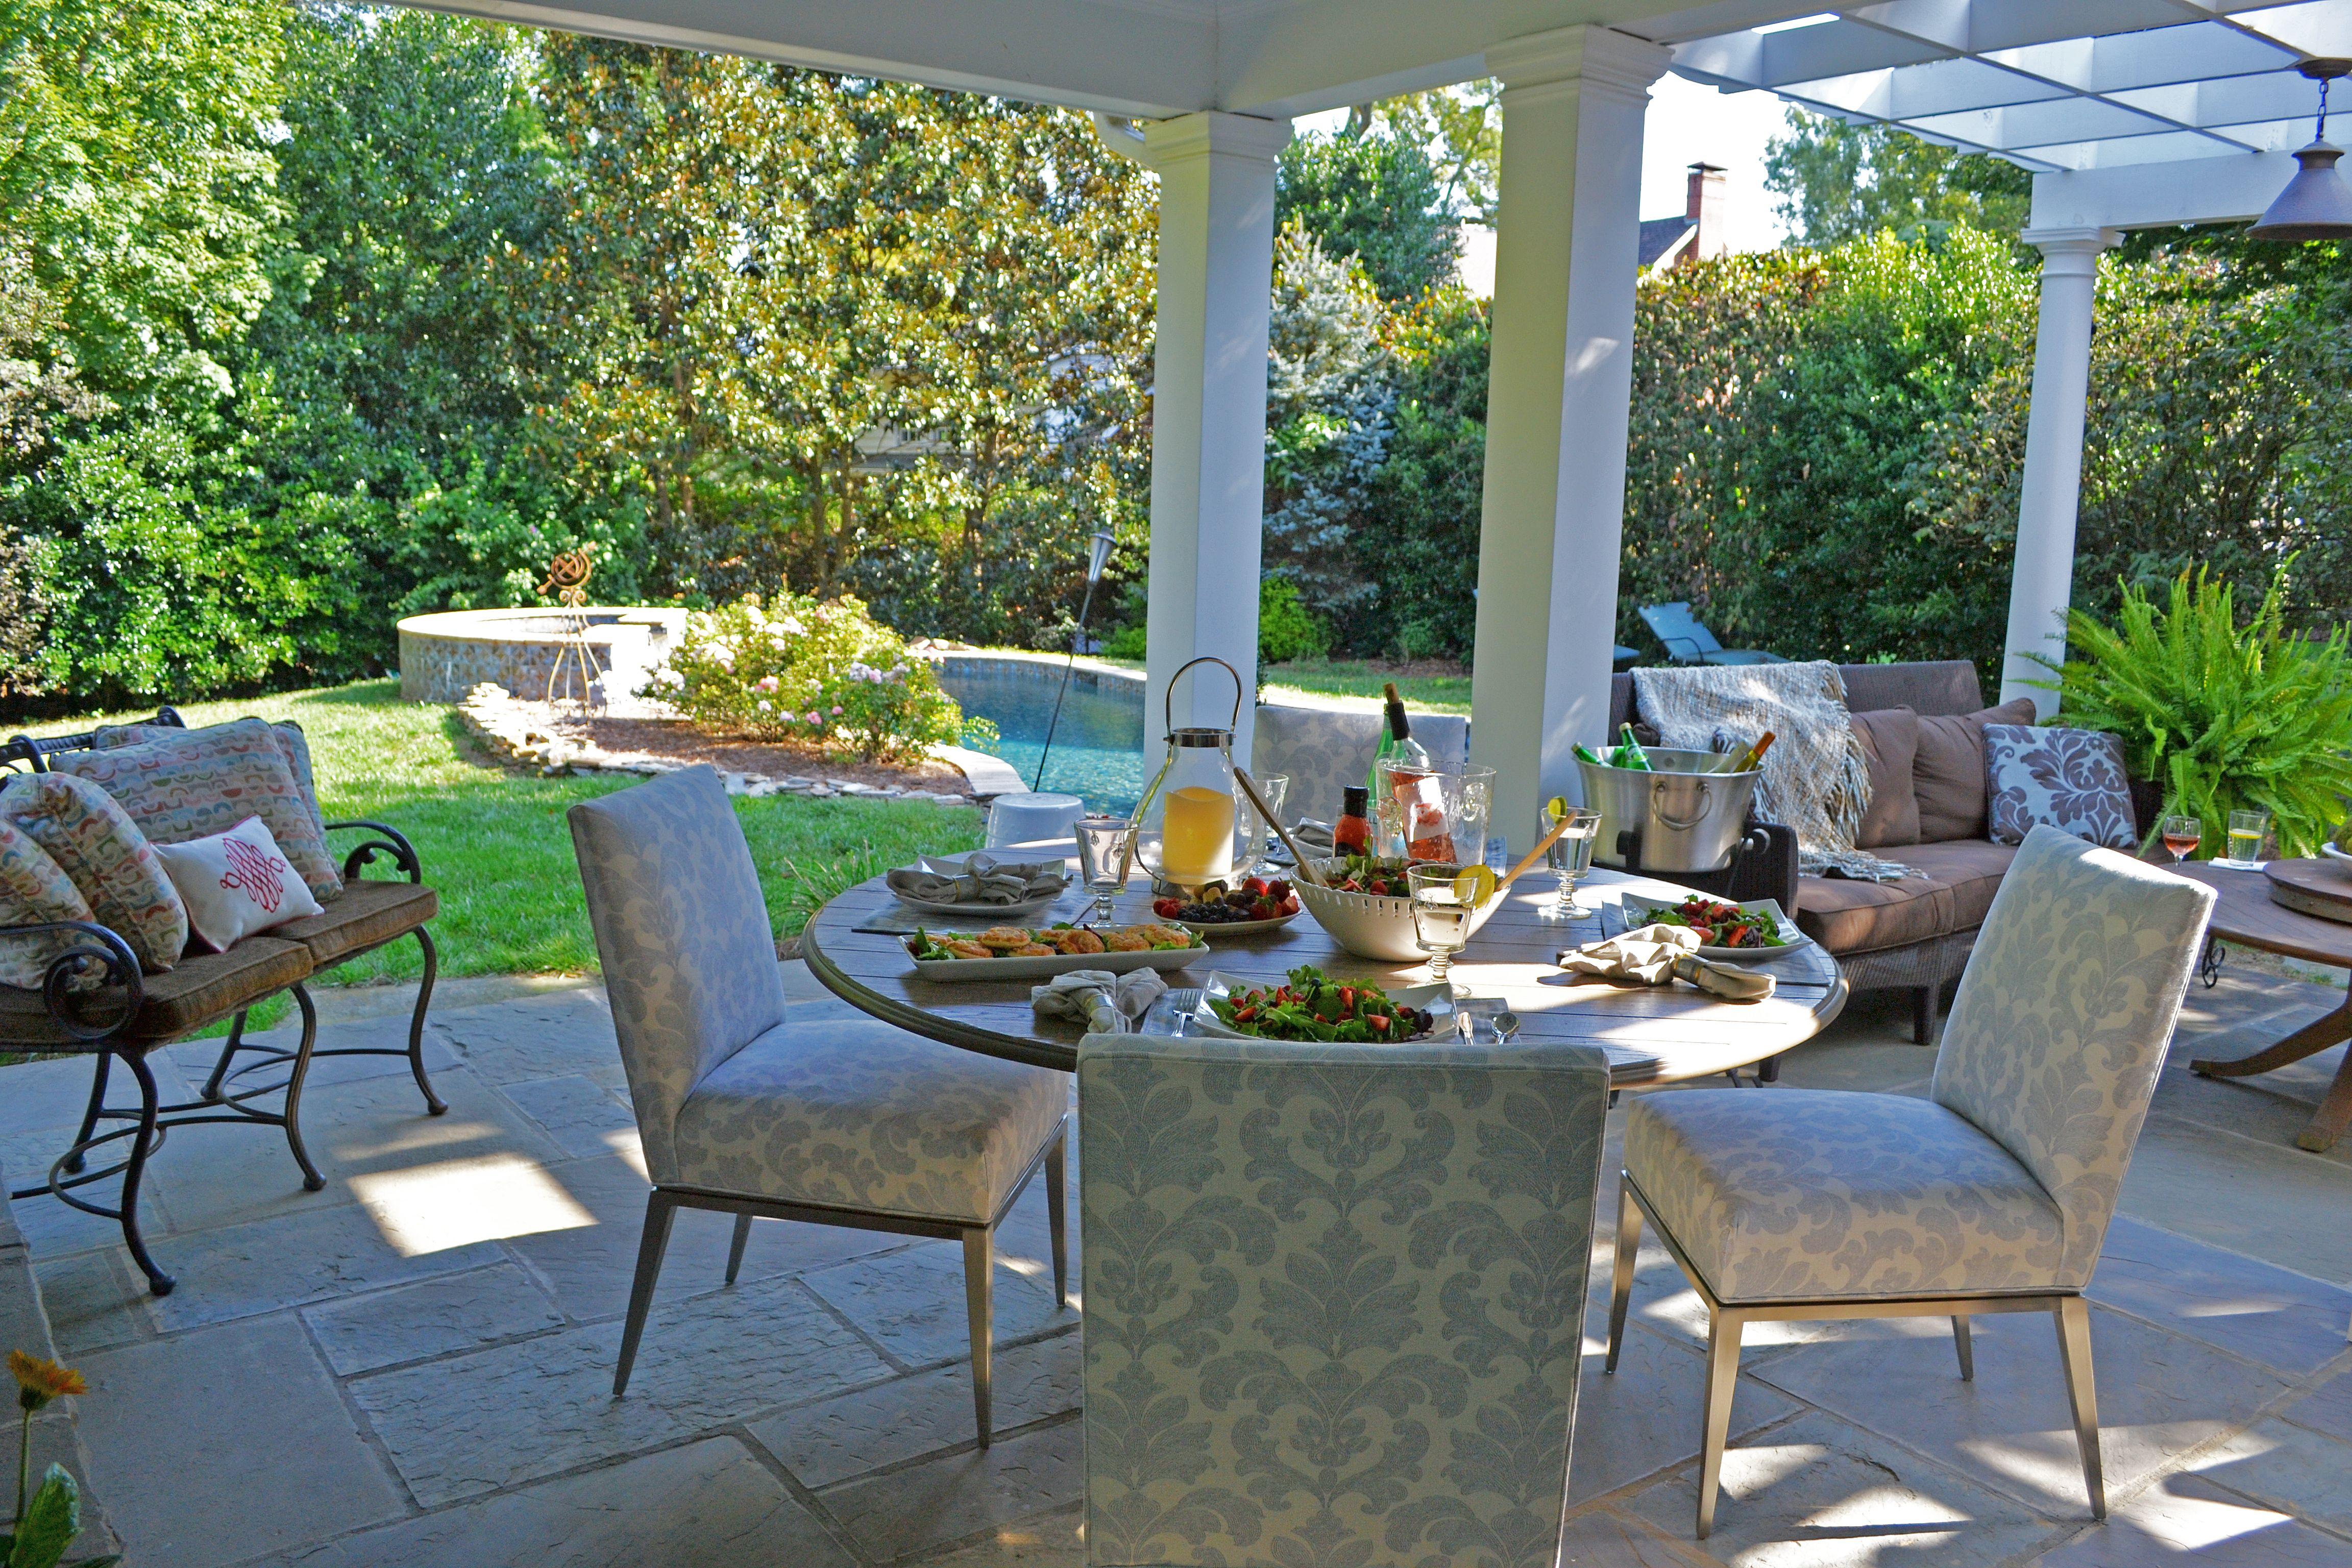 Pin By Designmaster Furniture On Veranda Dining Covered Outdoor Area Outdoor Decor Patio